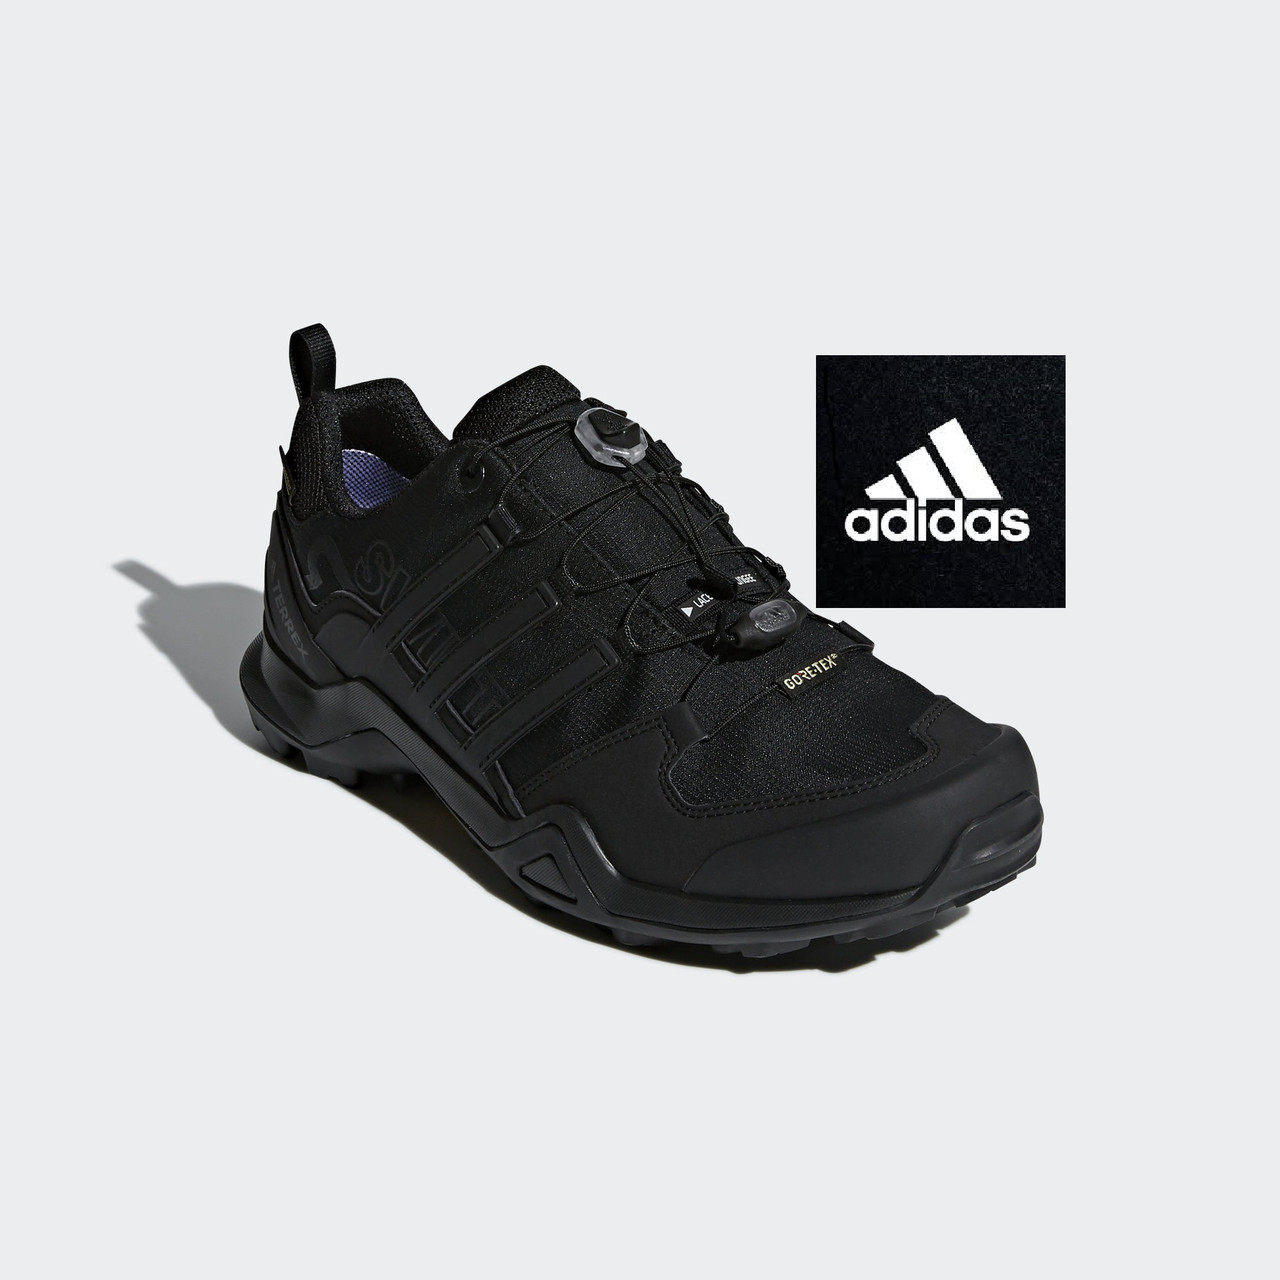 the best attitude 4d6ba 35ab3 Оригинал кроссовки Adidas Terrex Swift R2 GTX CM7492 - Интернет магазин